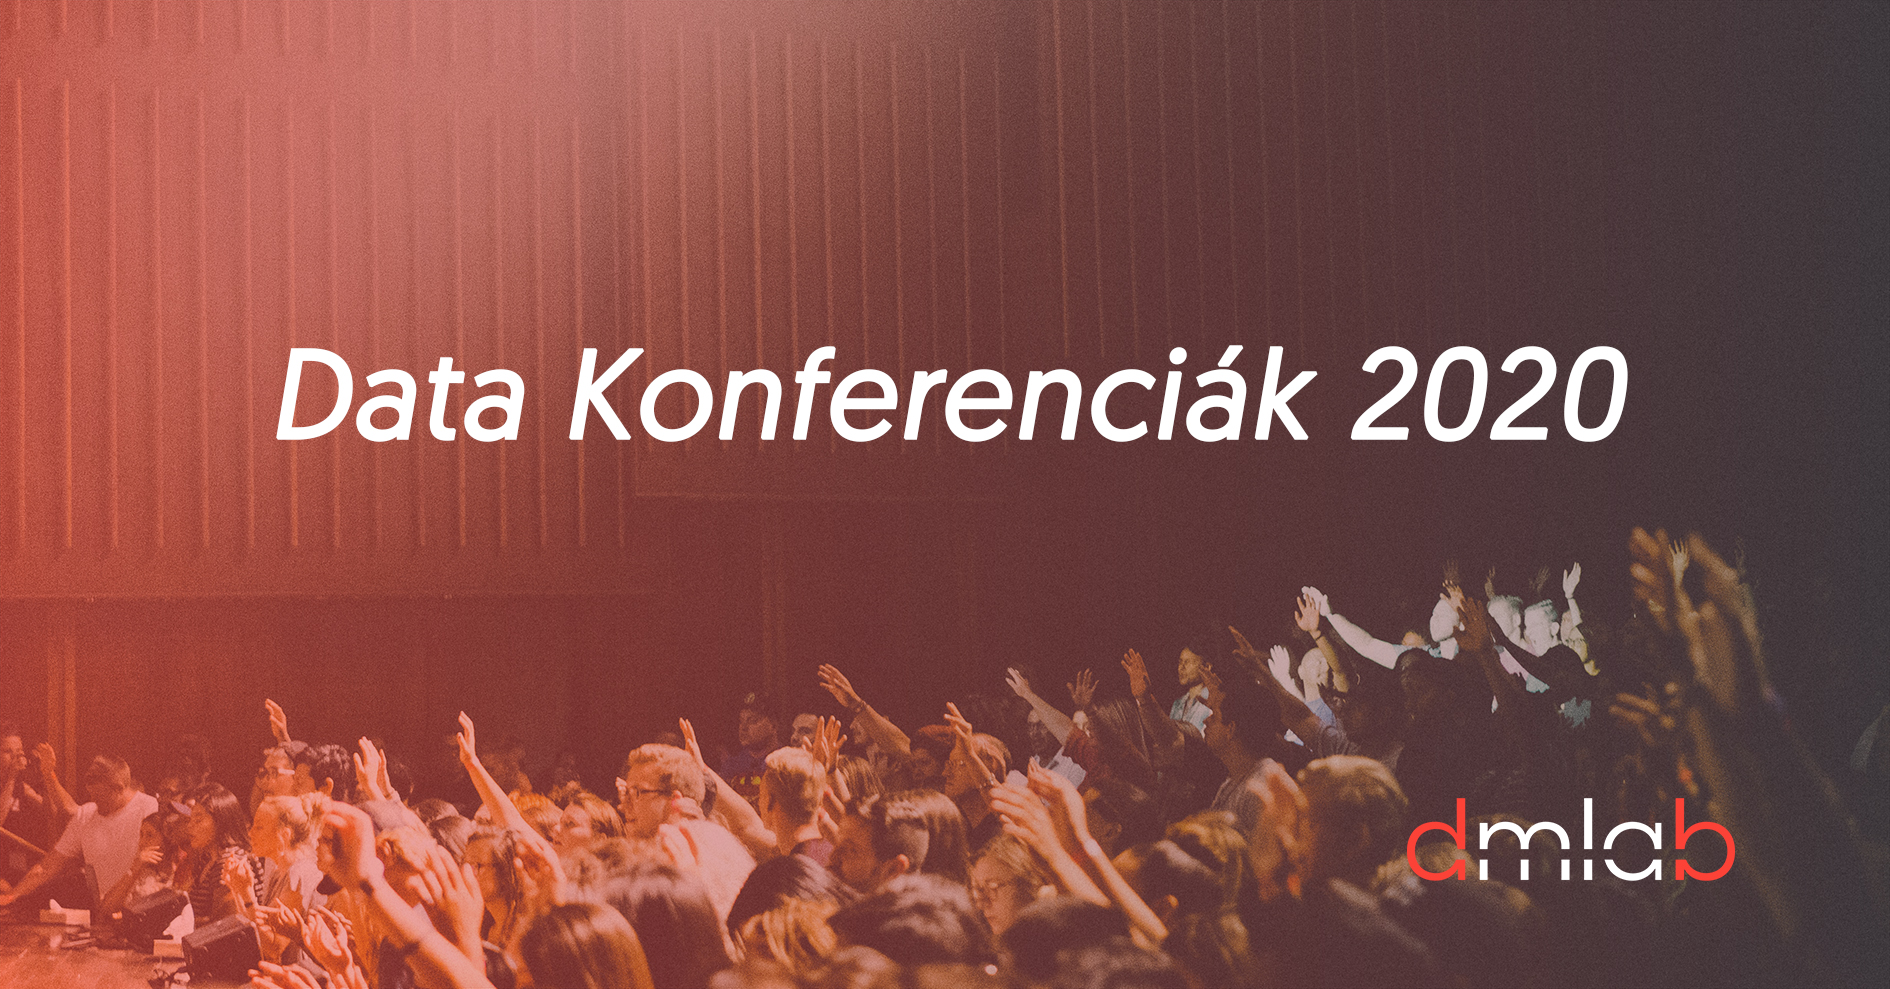 data_konferencia_k_2020_bori_to_2.jpg